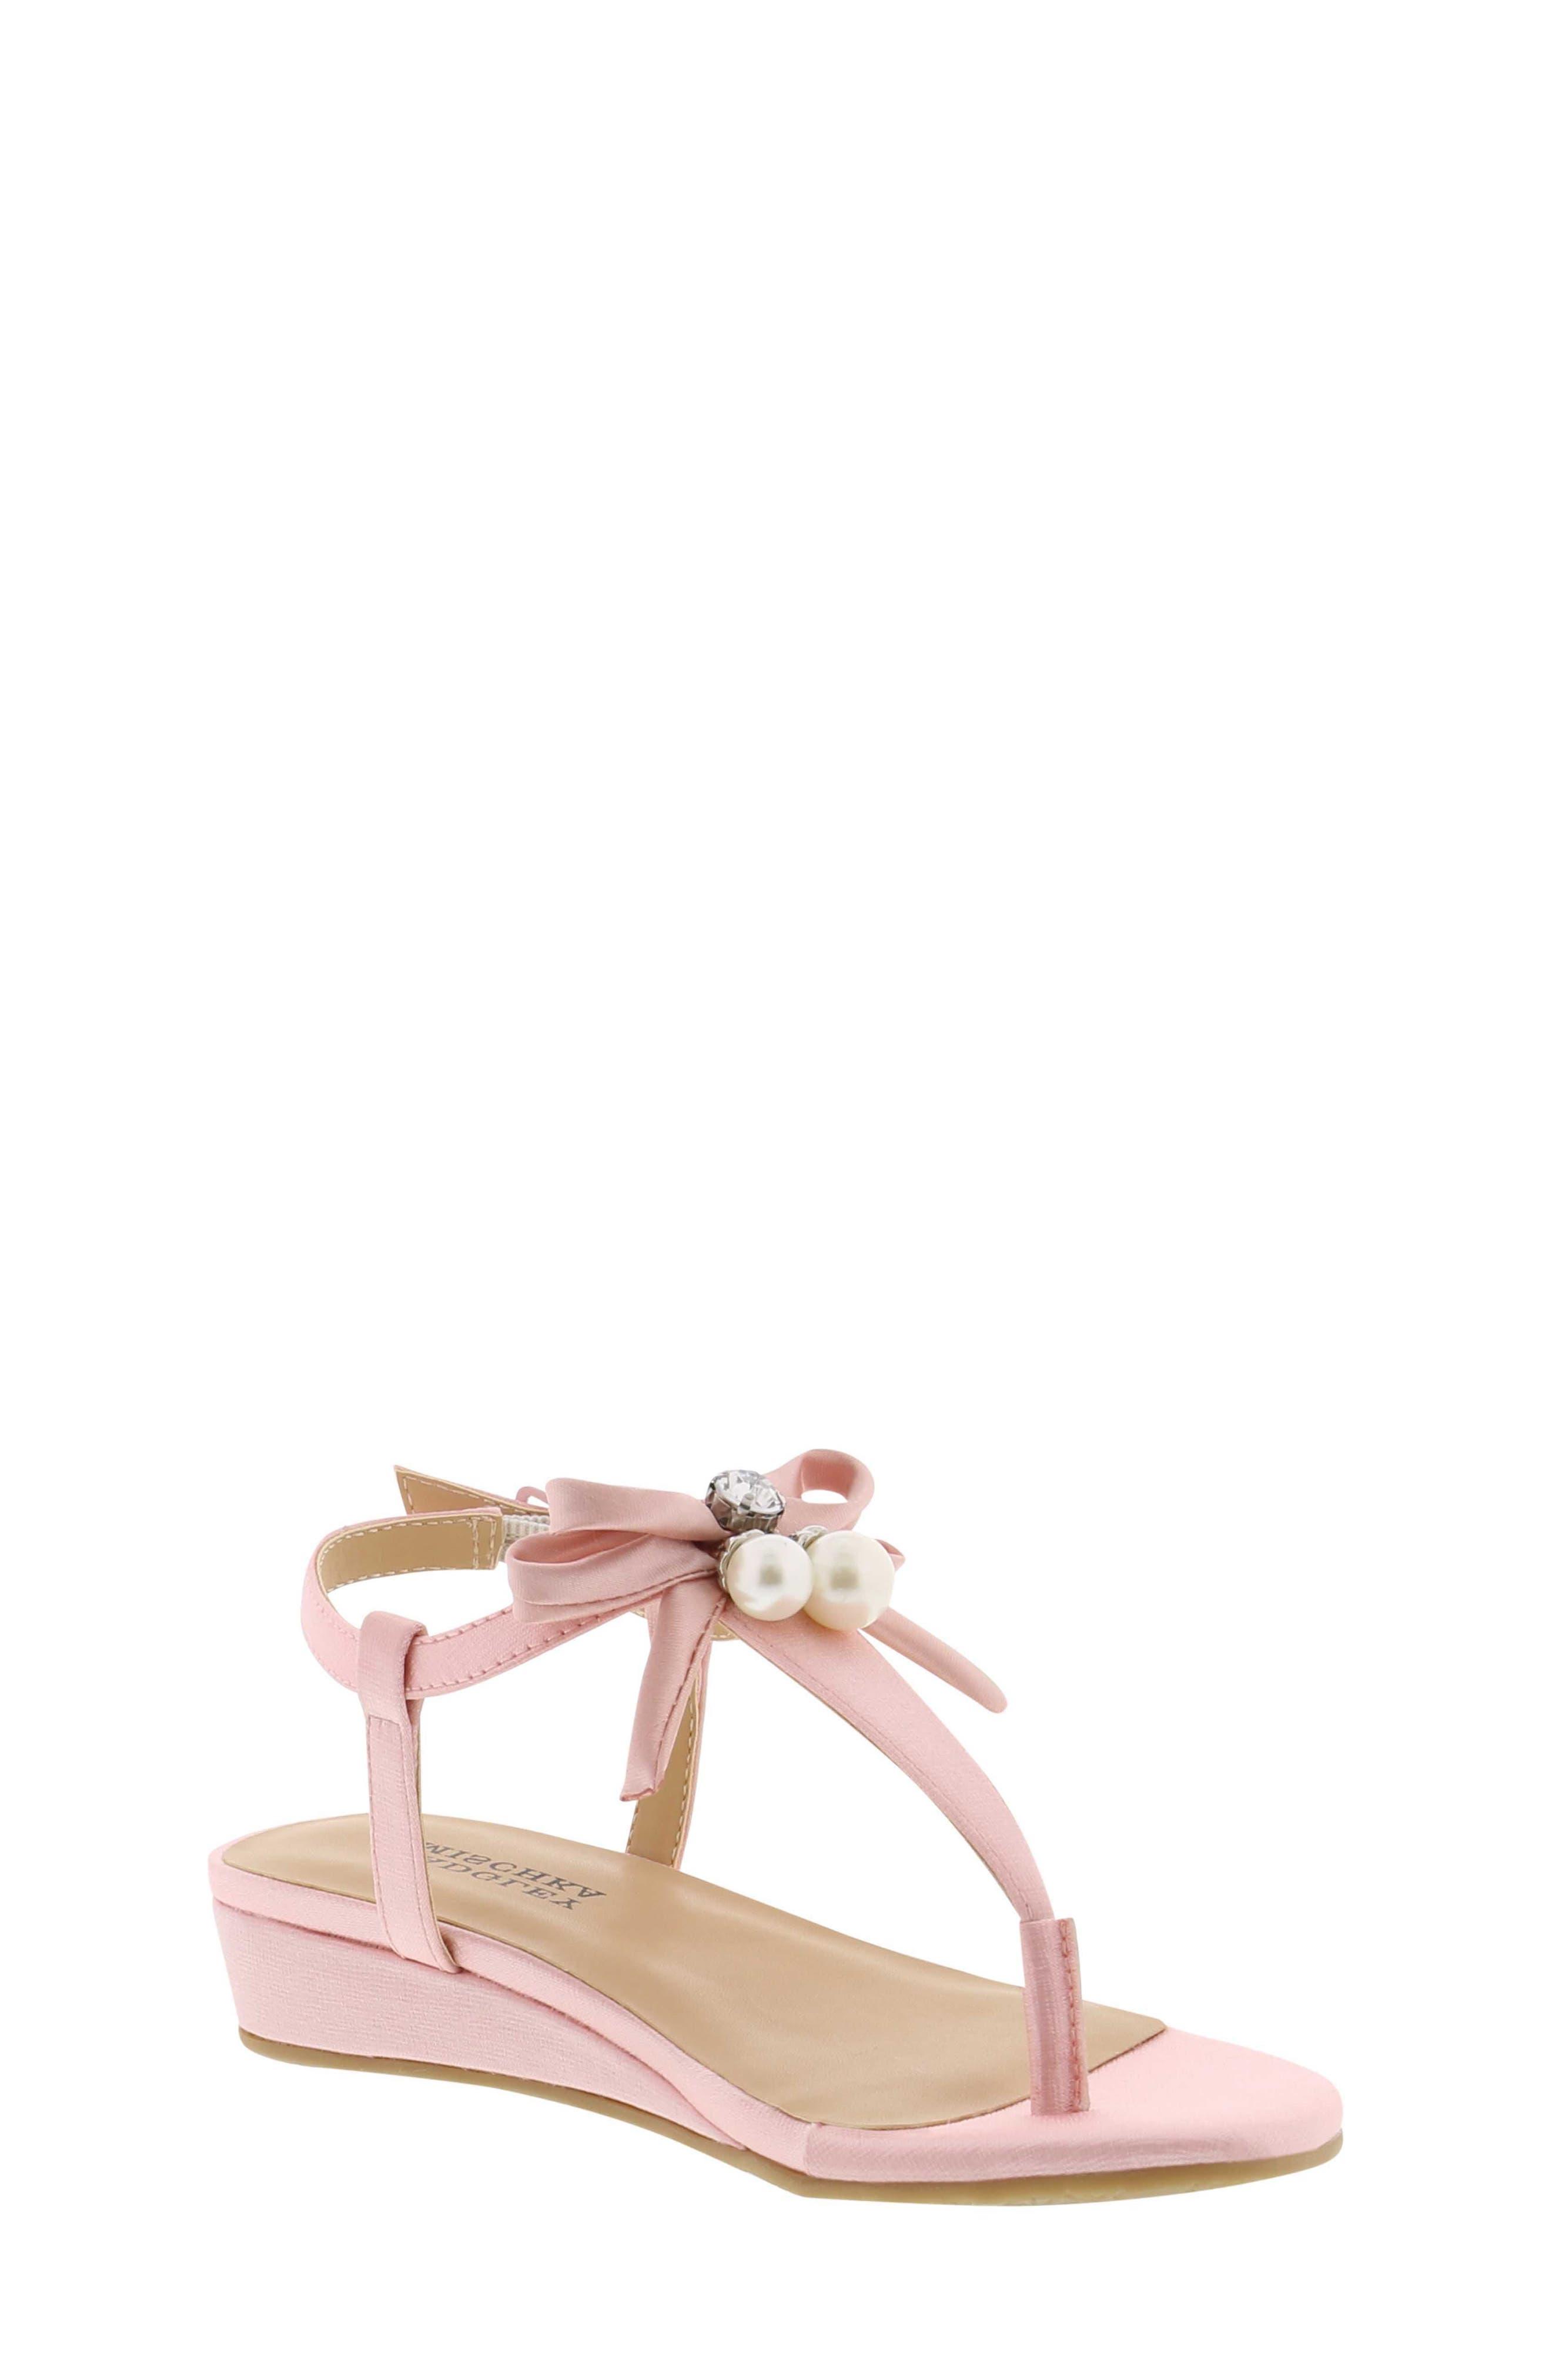 Talia Embellished Bow Sandal,                             Alternate thumbnail 2, color,                             Light Pink